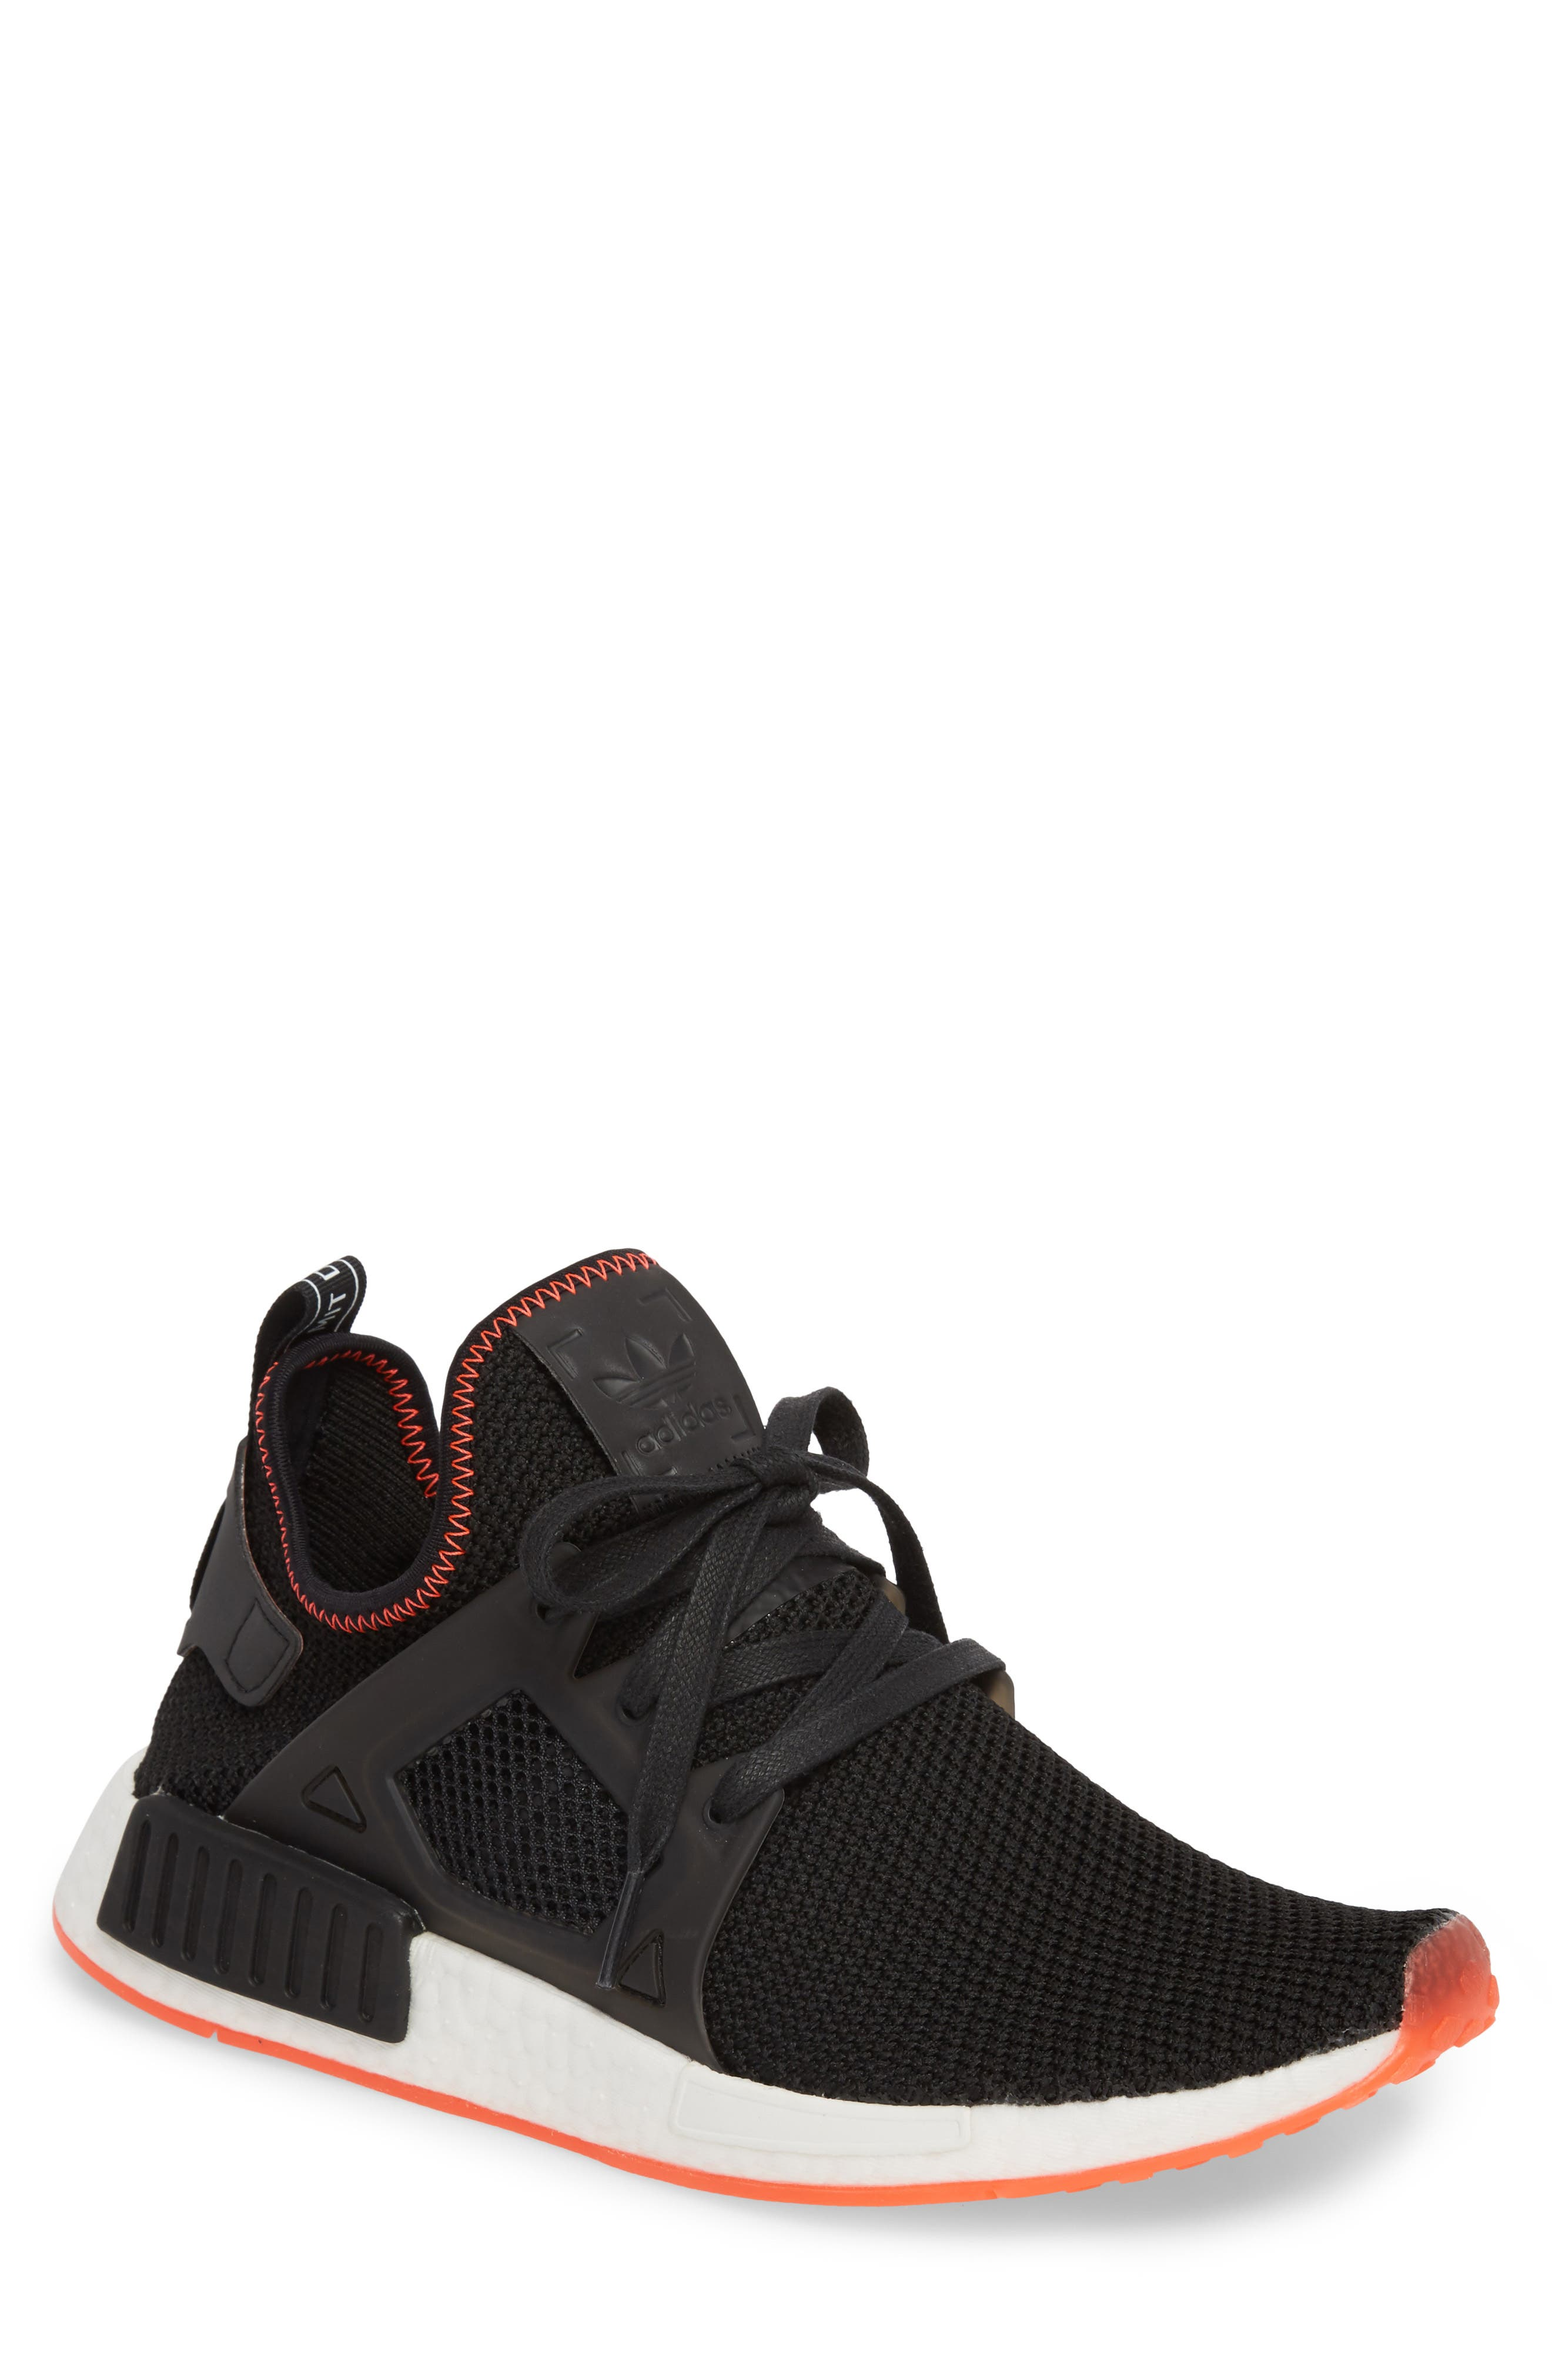 Alternate Image 1 Selected - adidas NMD_XR1 Sneaker (Men)